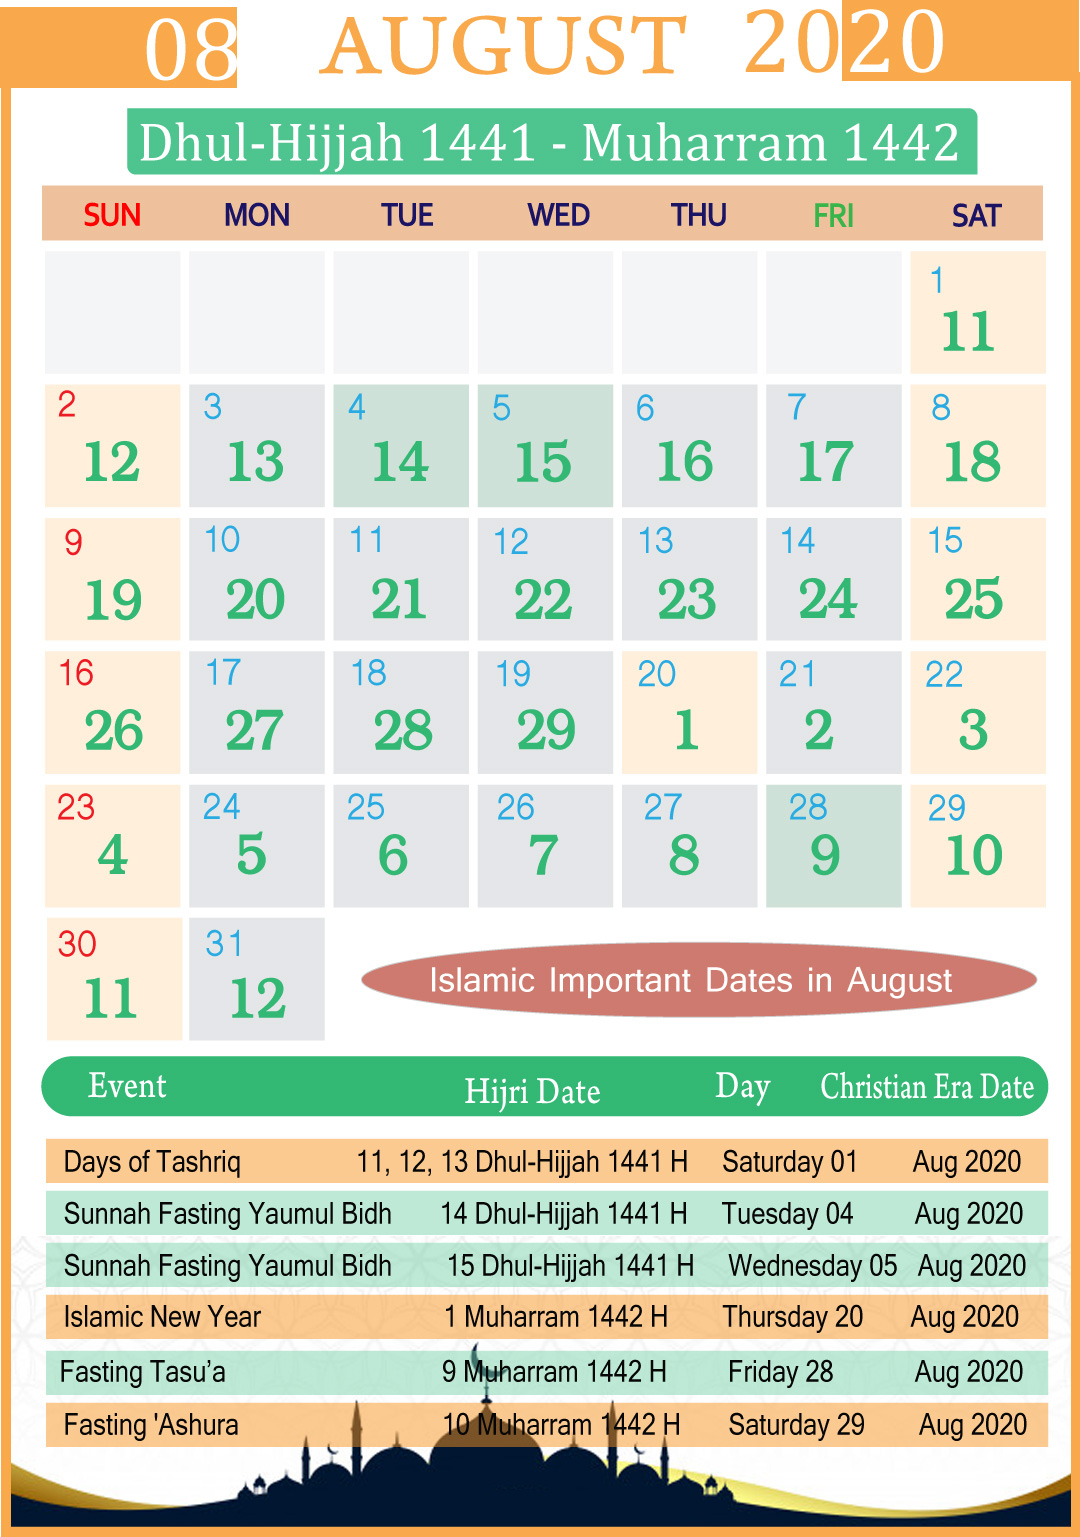 Islamic Calendar August 2020 | Year throughout Kannada Calendar 2020 August